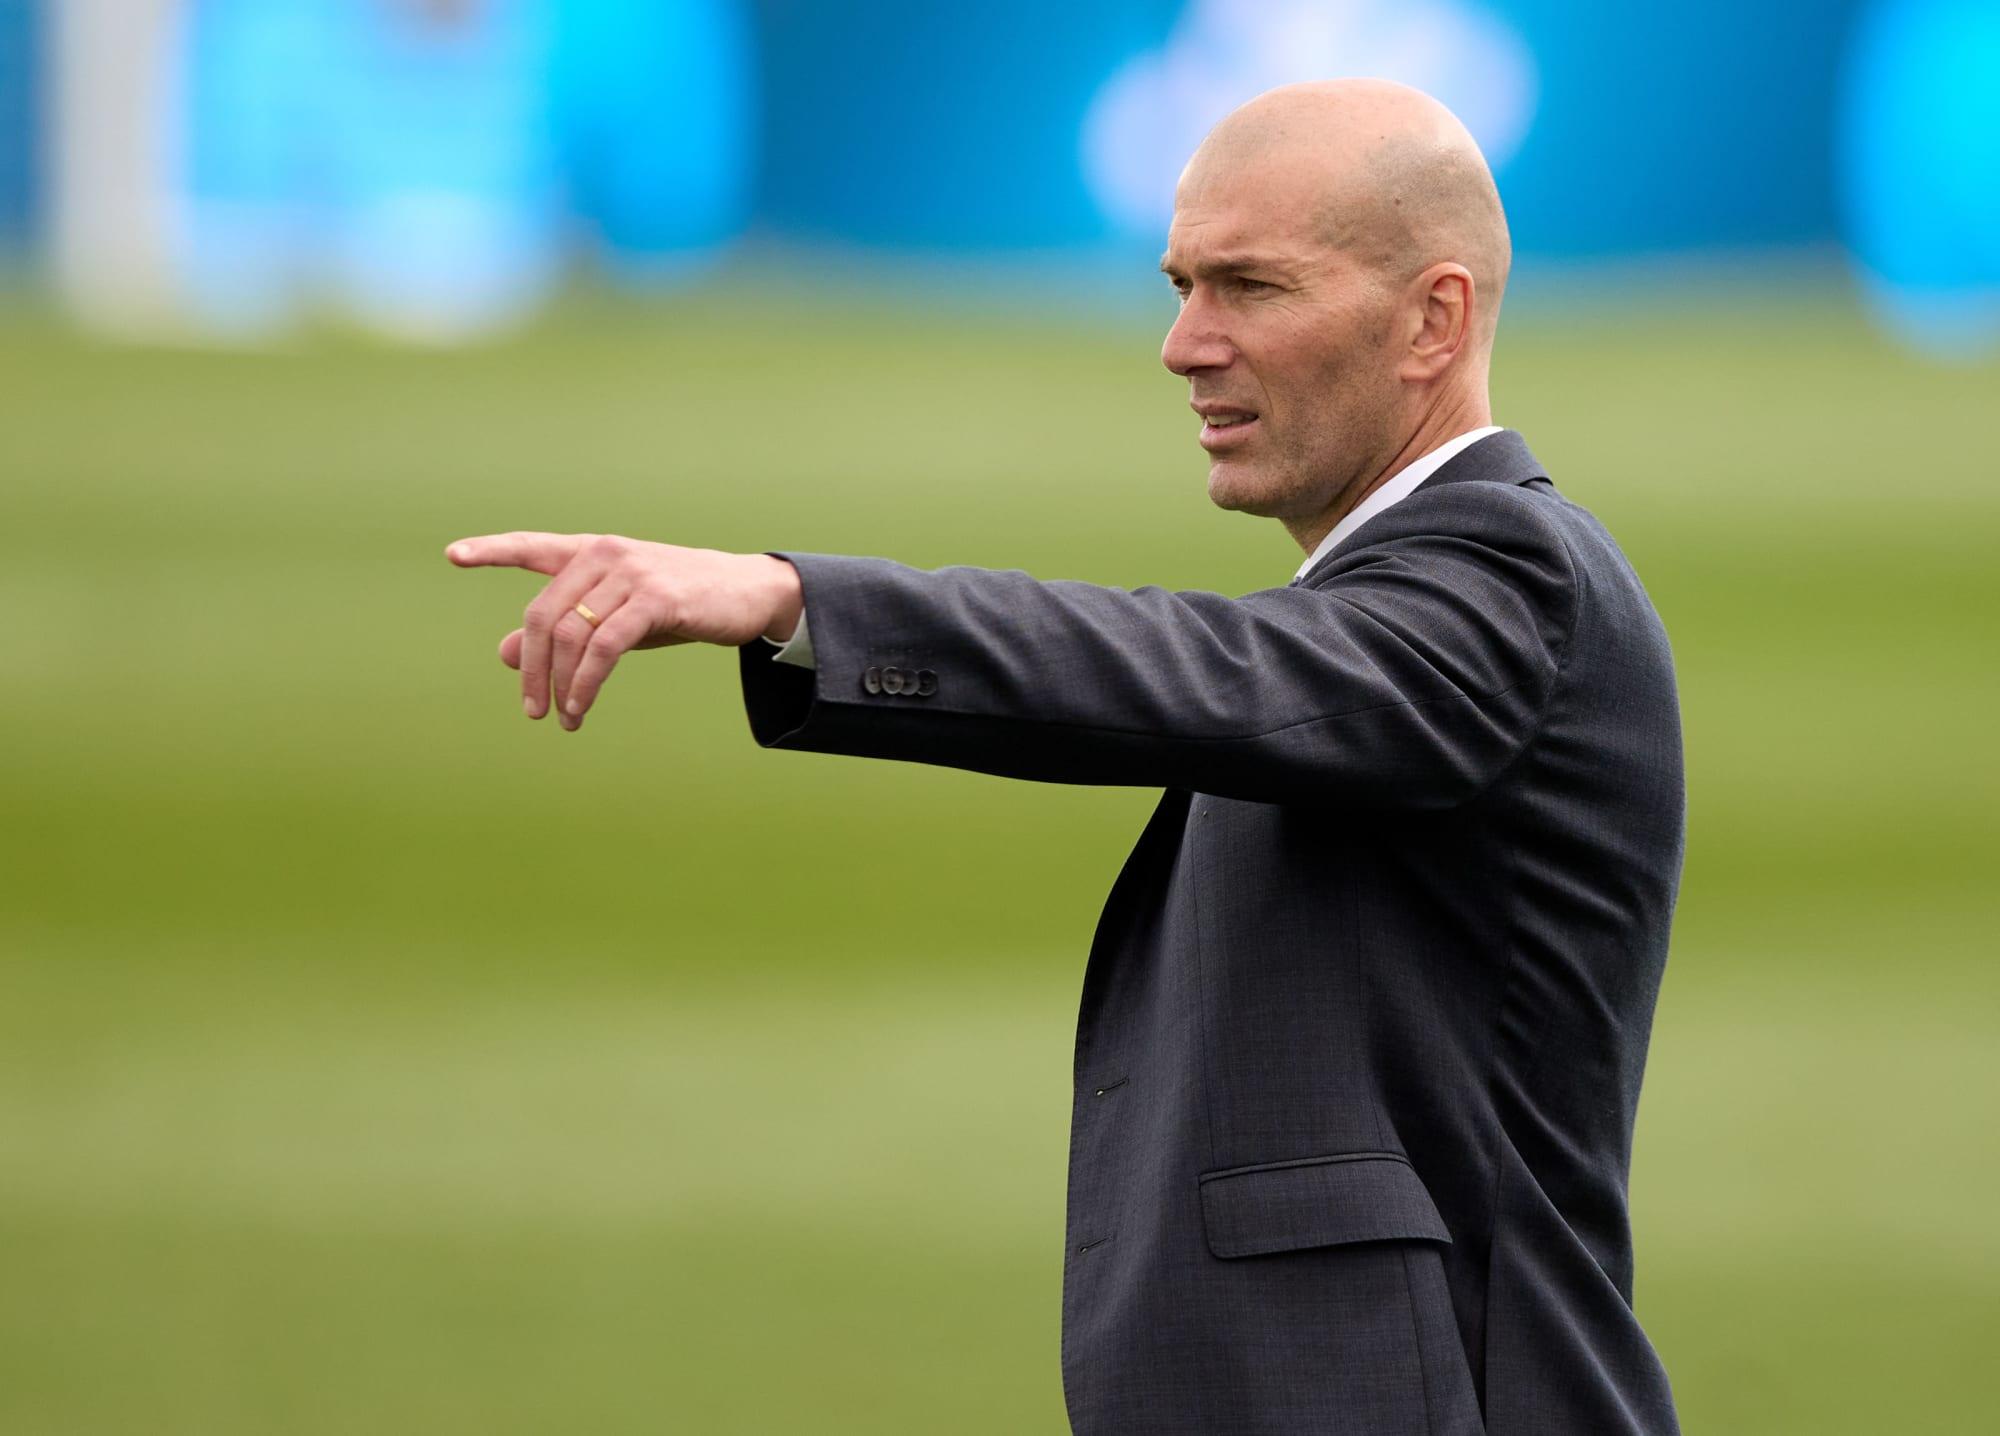 What are the chances of Zinedine Zidane returning to Juventus?